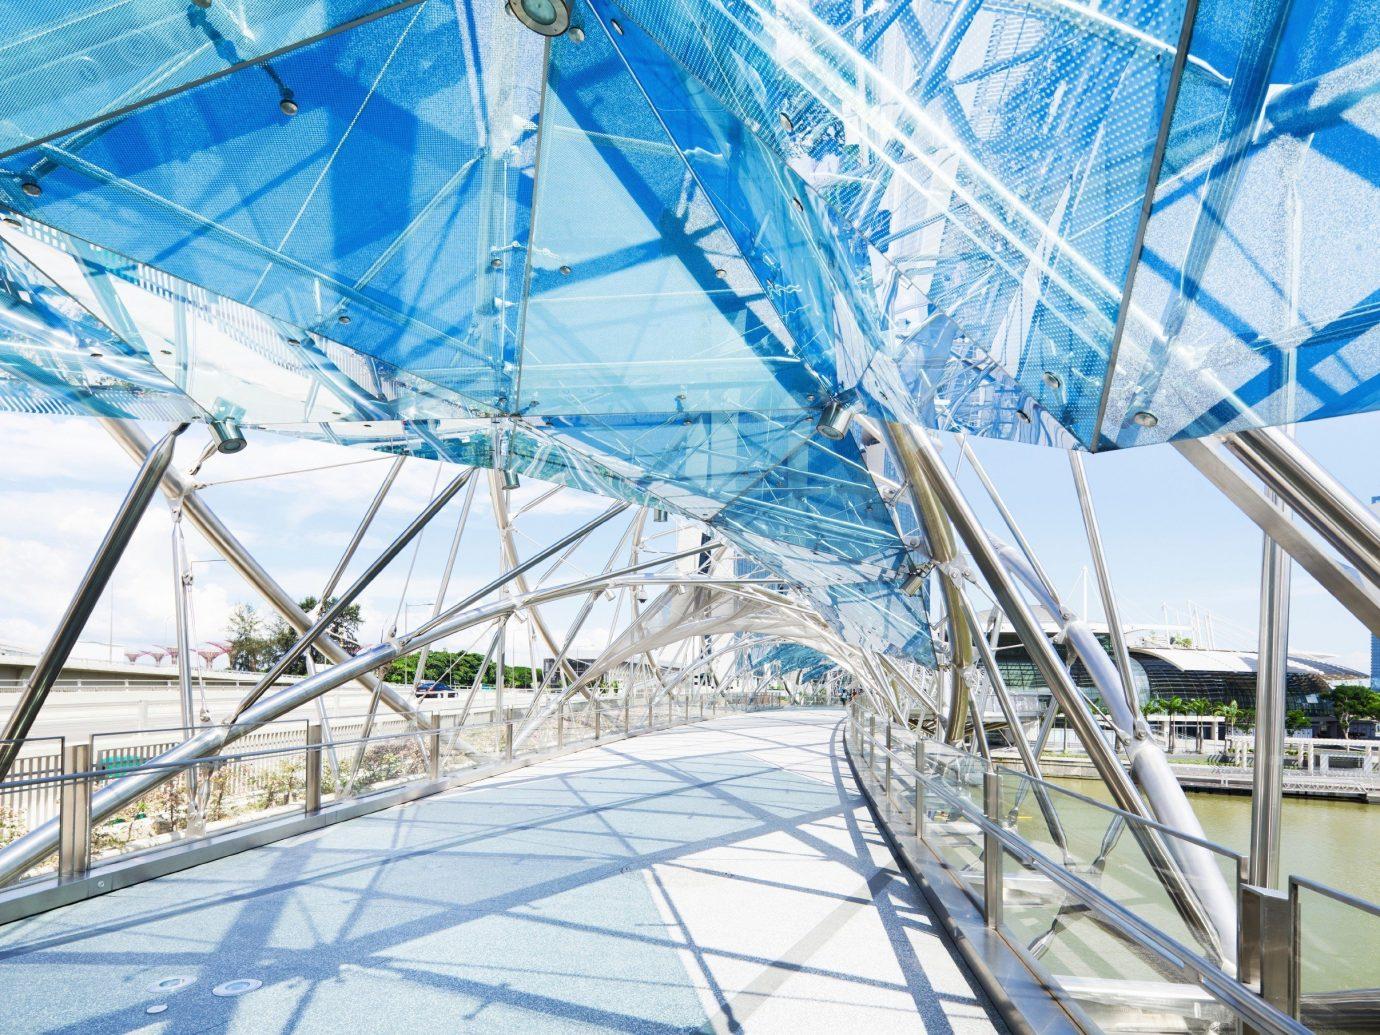 Trip Ideas outdoor ferris wheel sport venue amusement park tourist attraction stadium energy facade mast arena